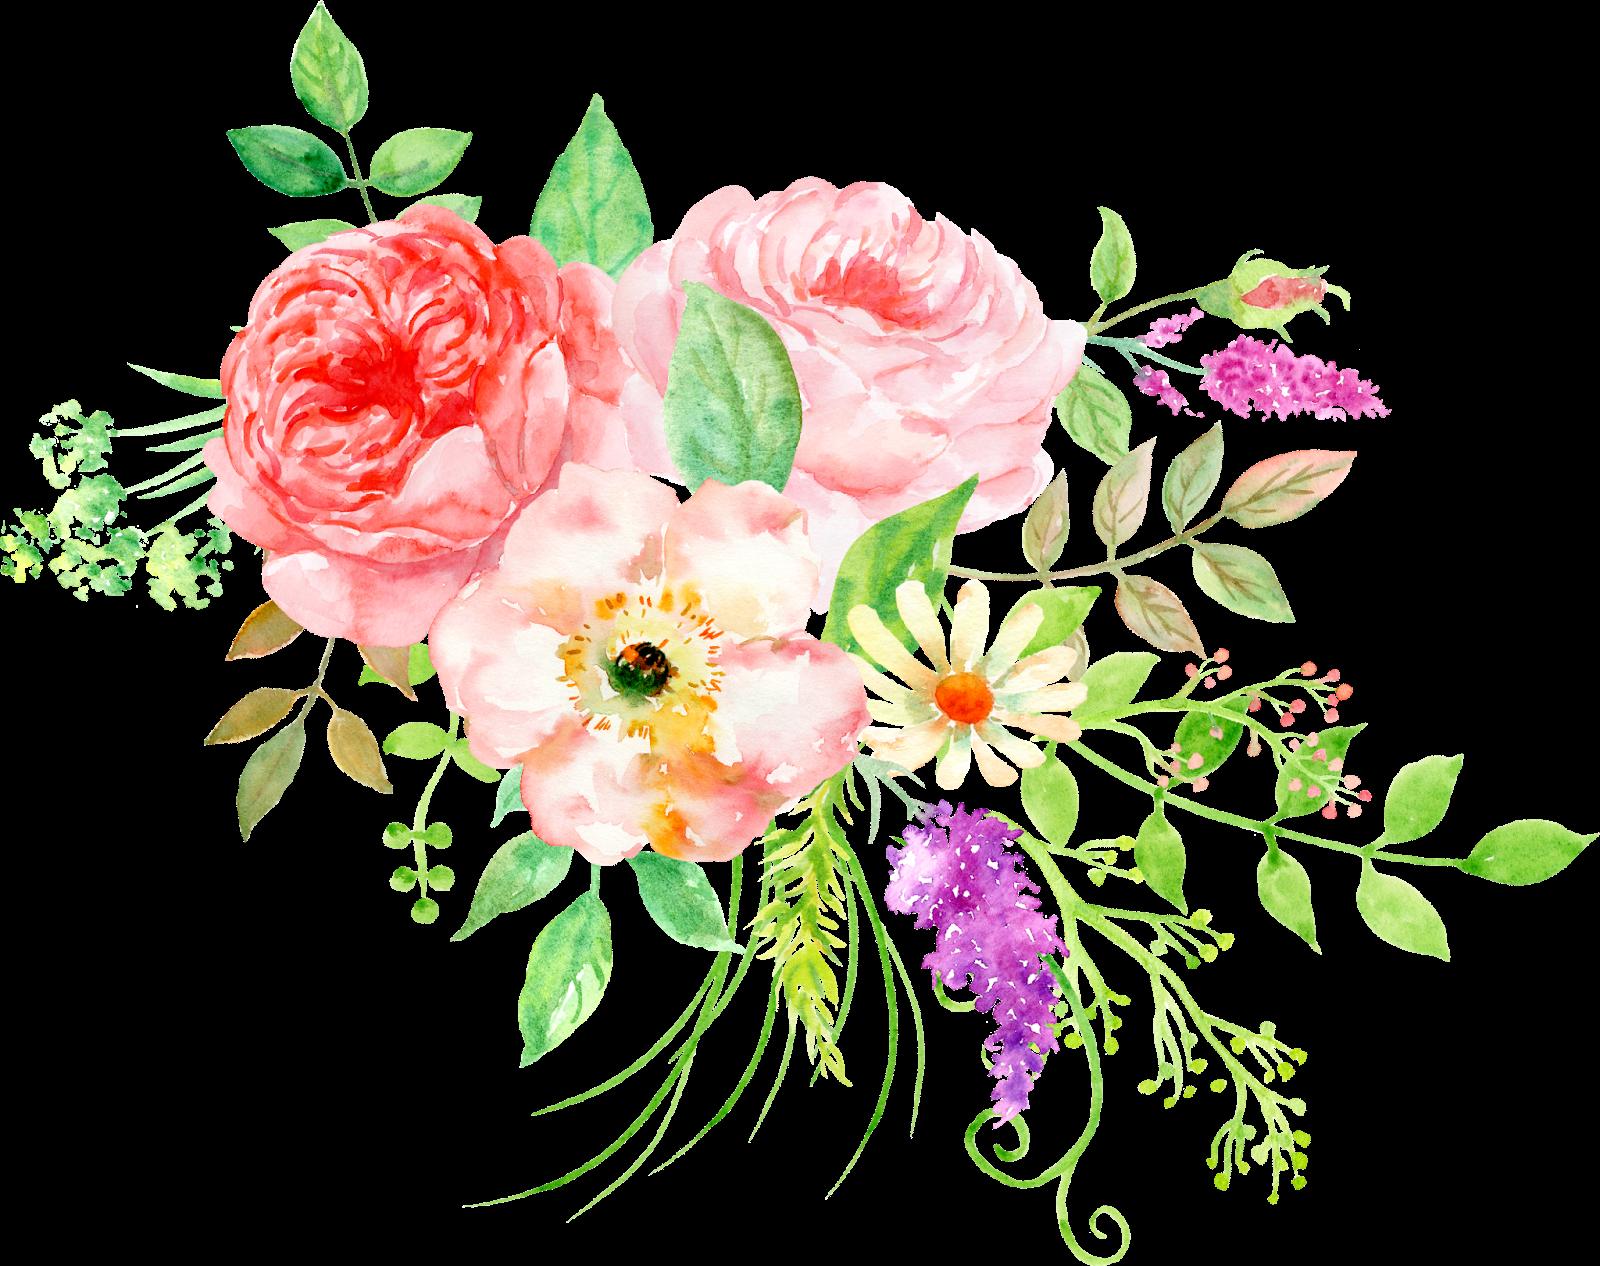 Pear clipart lukisan. Flower bouquet watercolor painting